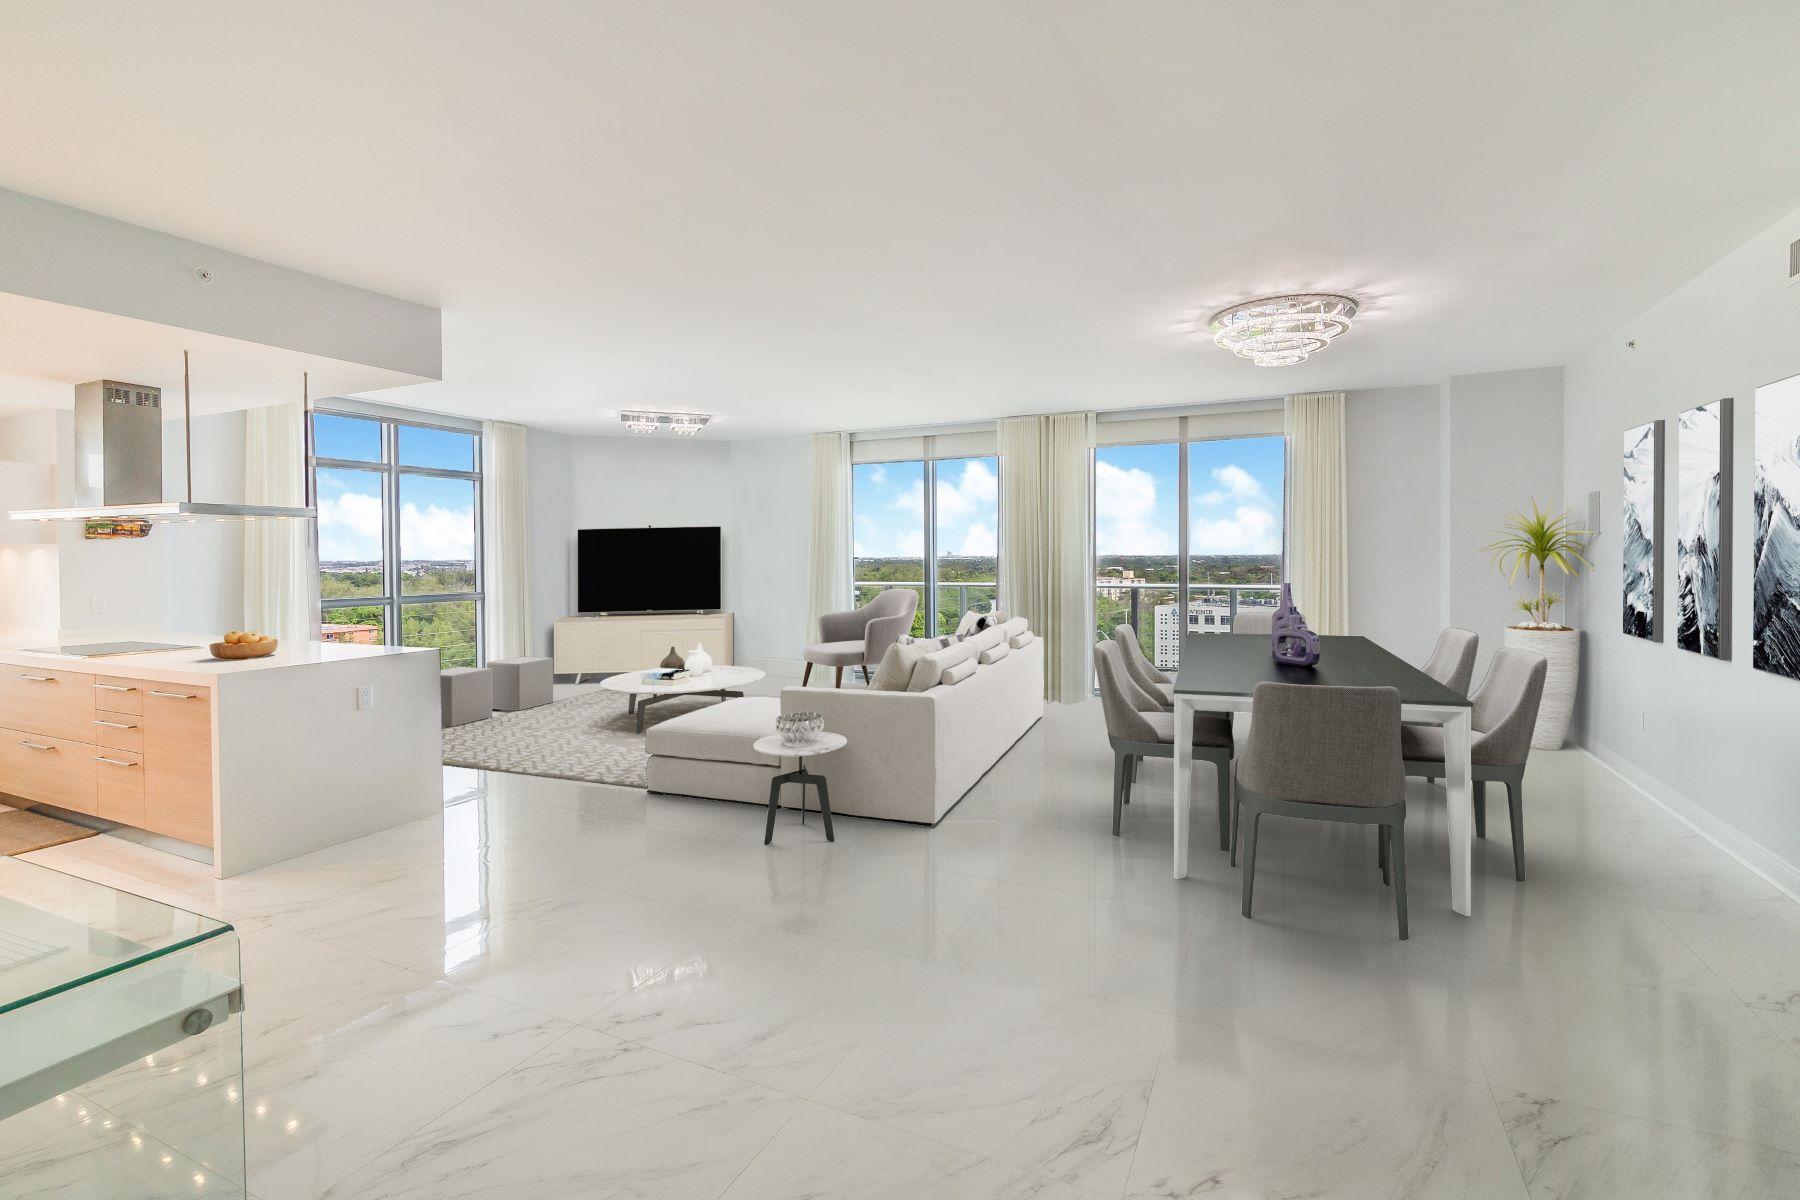 condominiums for Active at 17301 Biscayne Blvd #1202 17301 Biscayne Blvd 1202 North Miami Beach, Florida 33160 United States